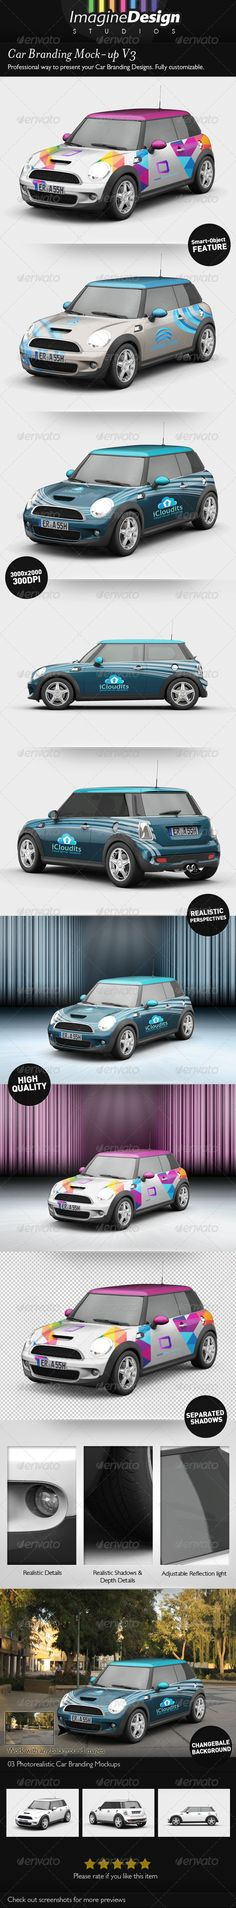 Car Branding Mock-up V3 - http://startupstacks.com/graphics/car-branding-mock-v3.html - free download